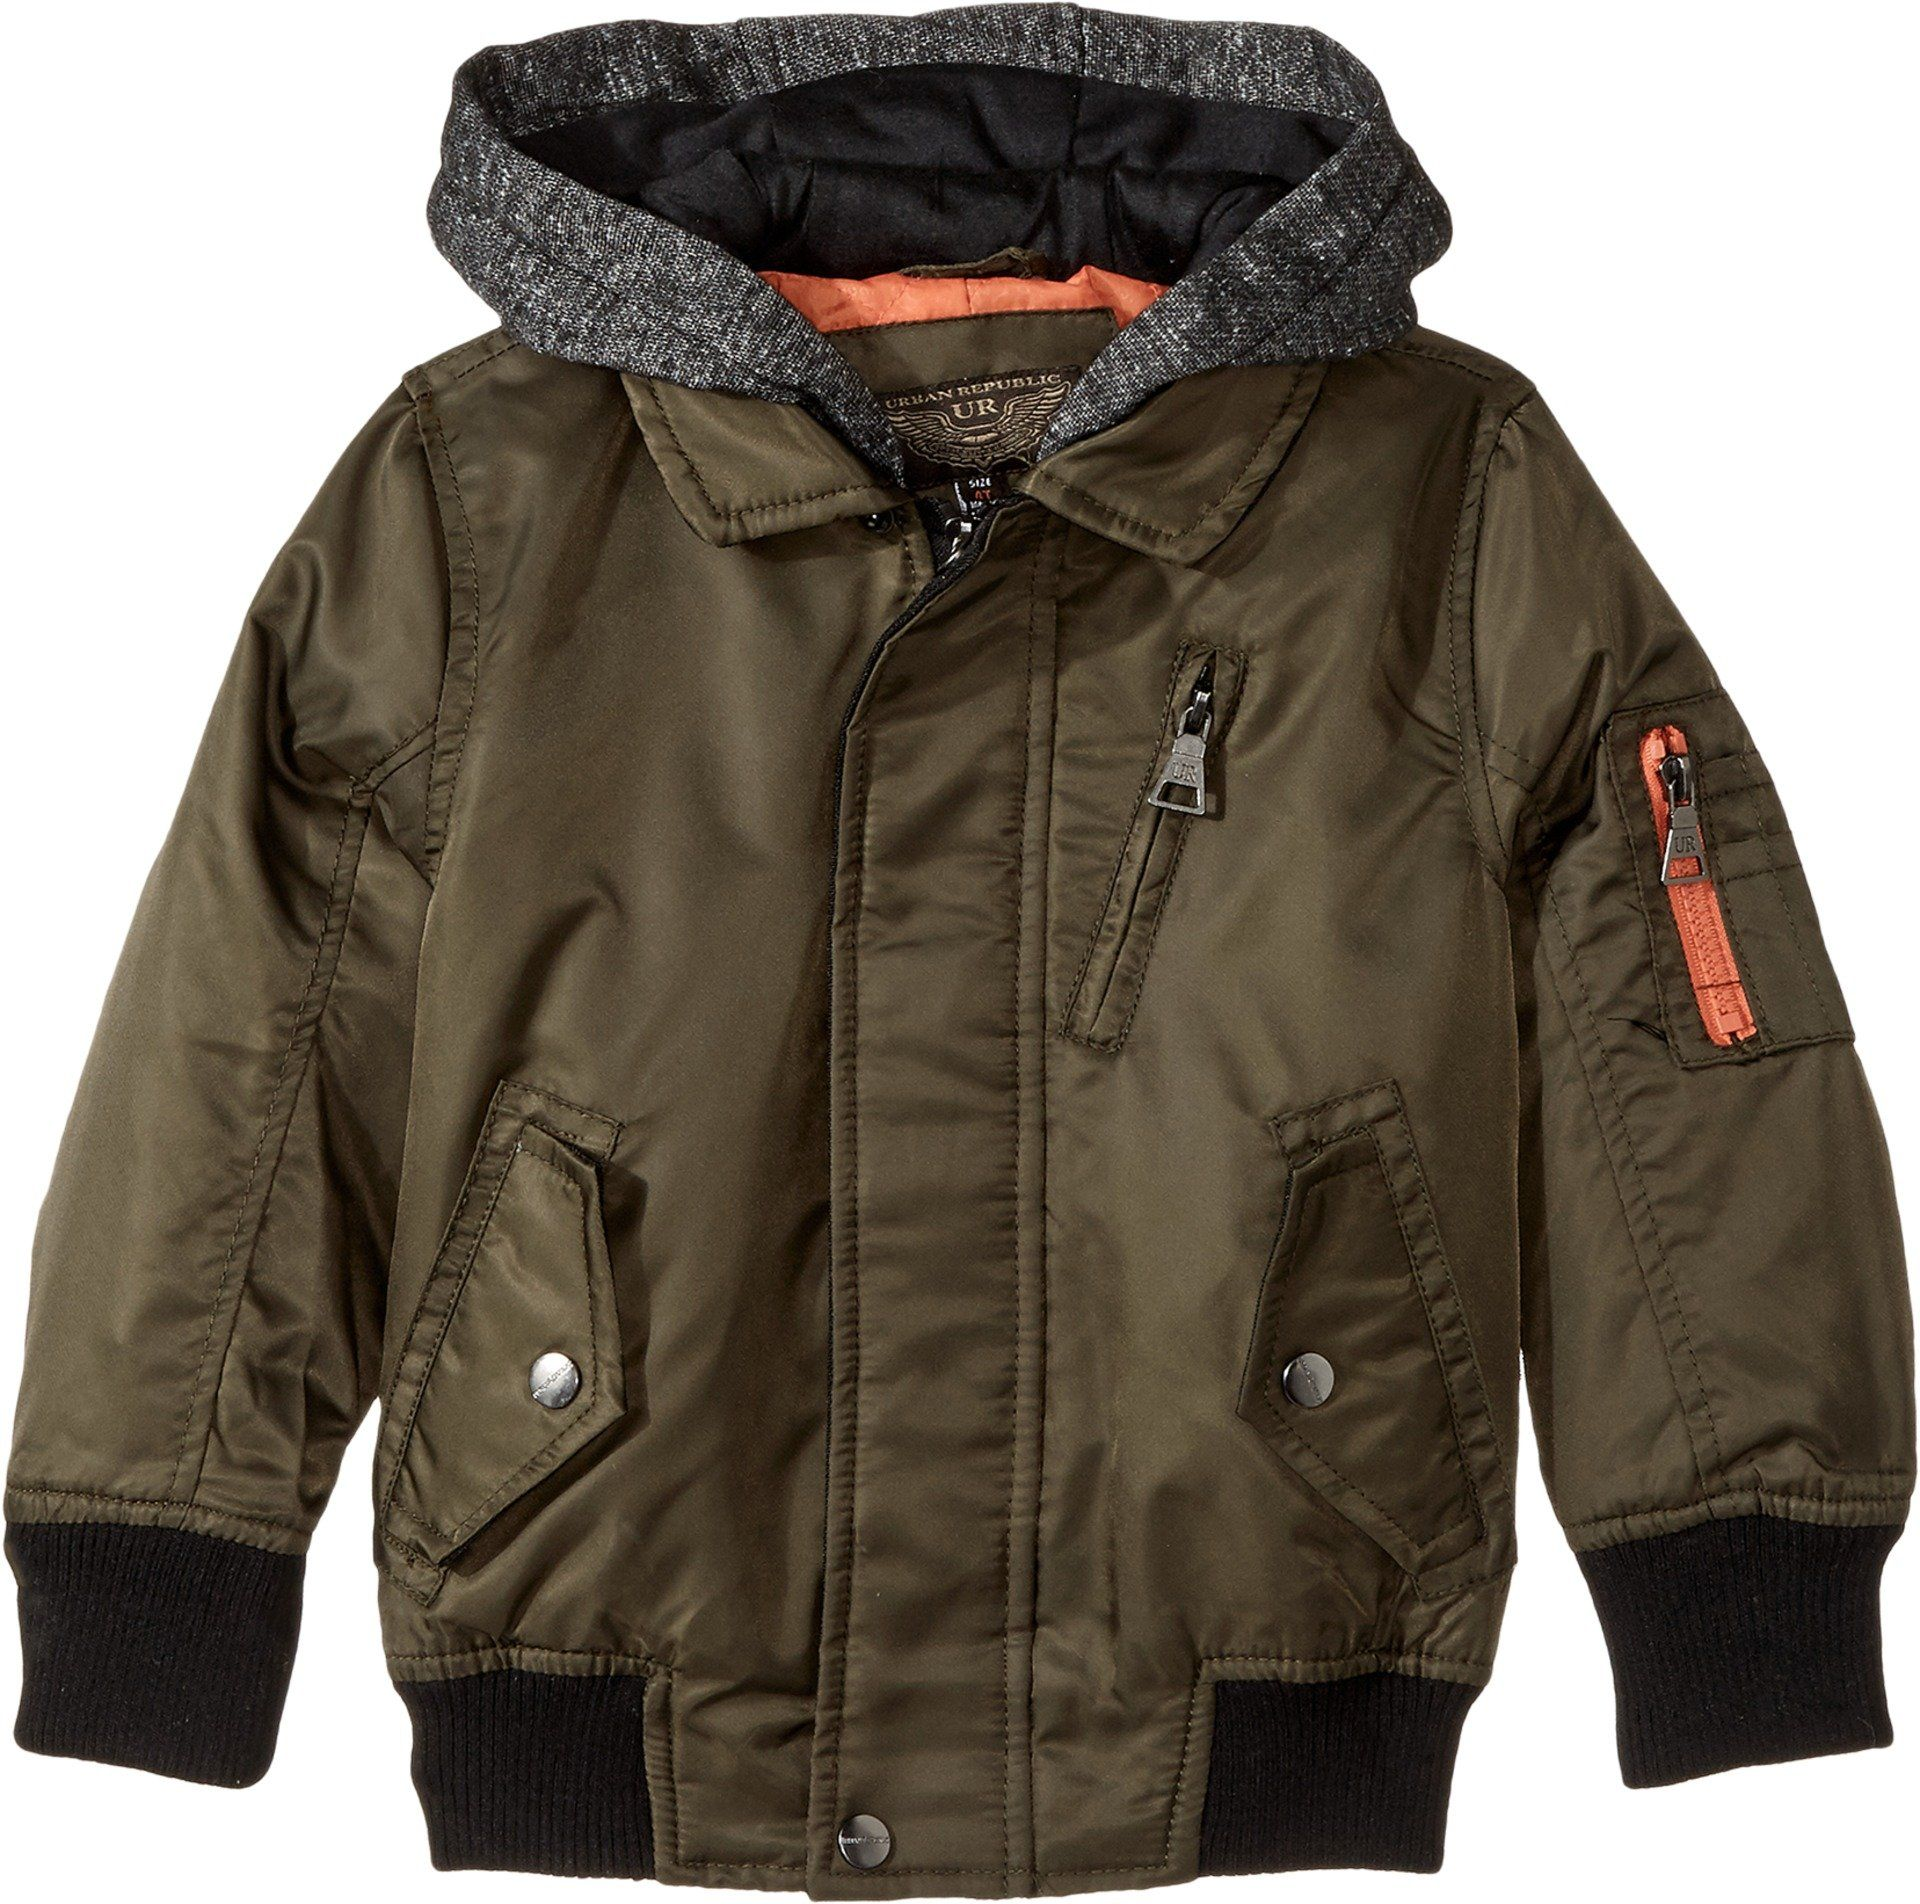 136789c05 Urban Republic Kids Baby Boy s Hooded Flight Jacket (Toddler) Olive ...